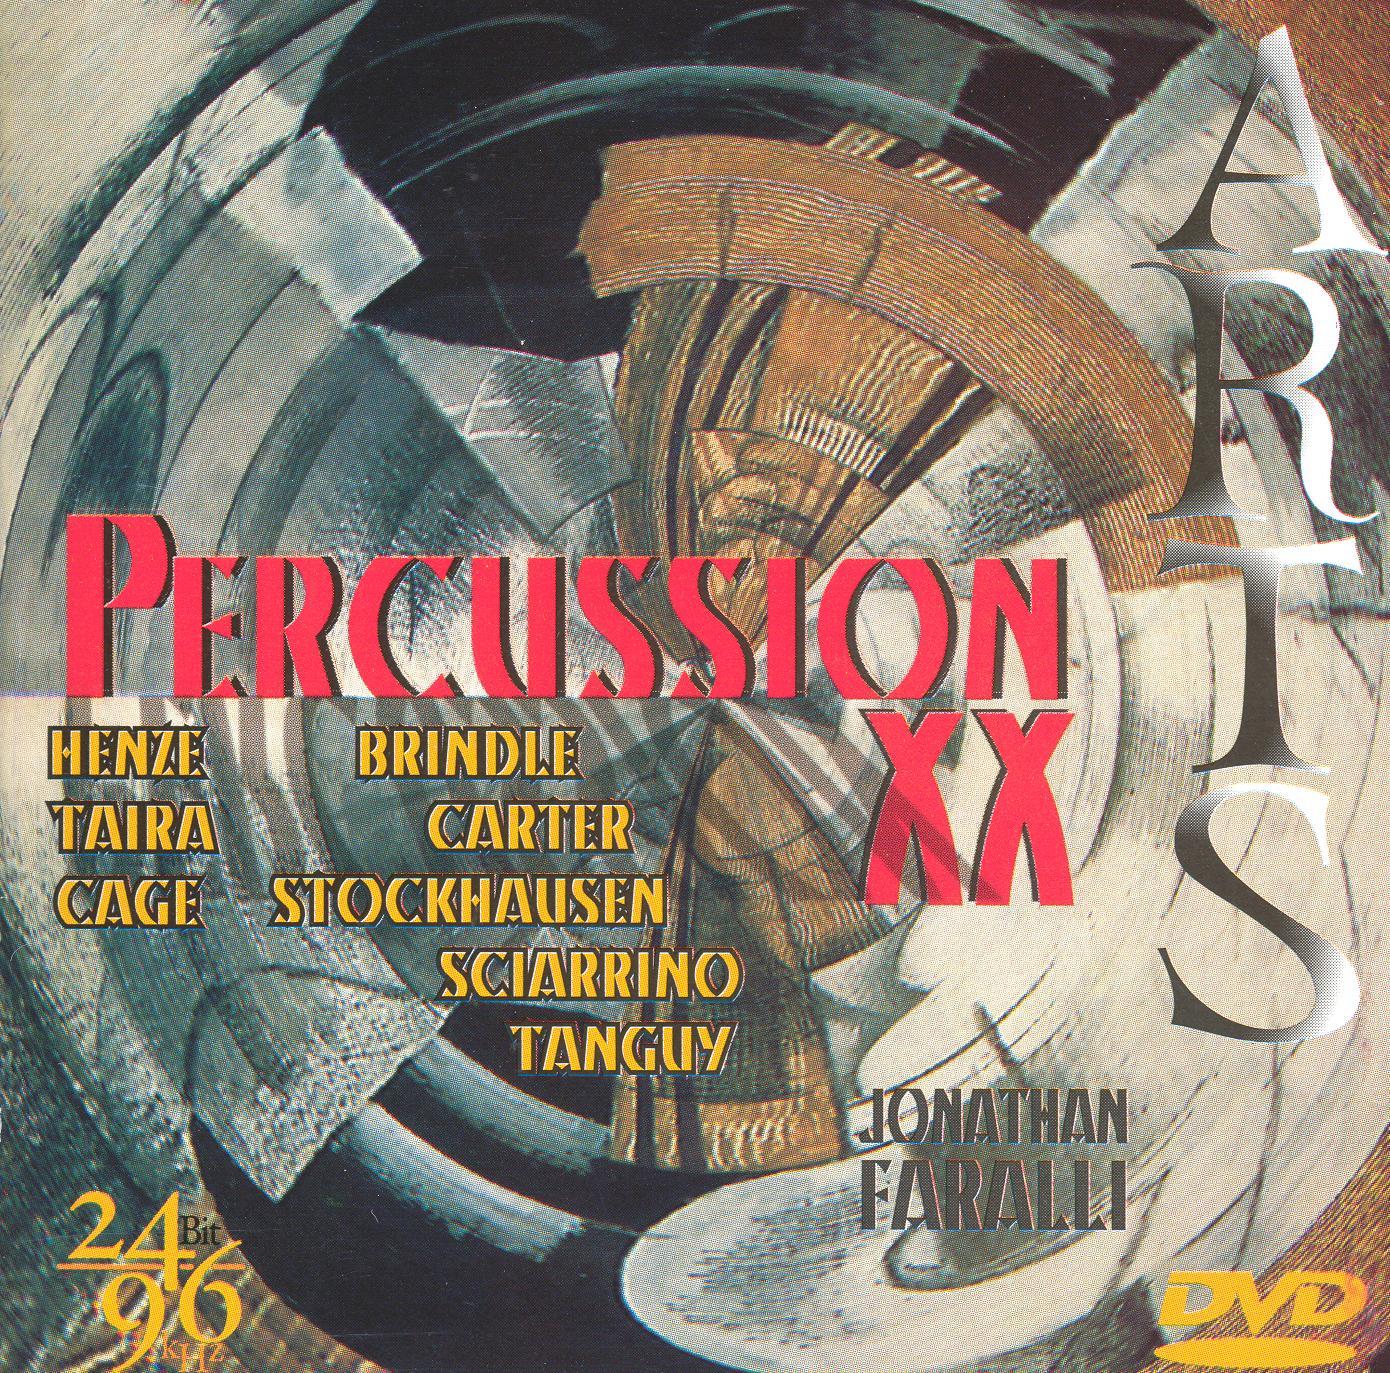 Jonathan Faralli: Percussion XX